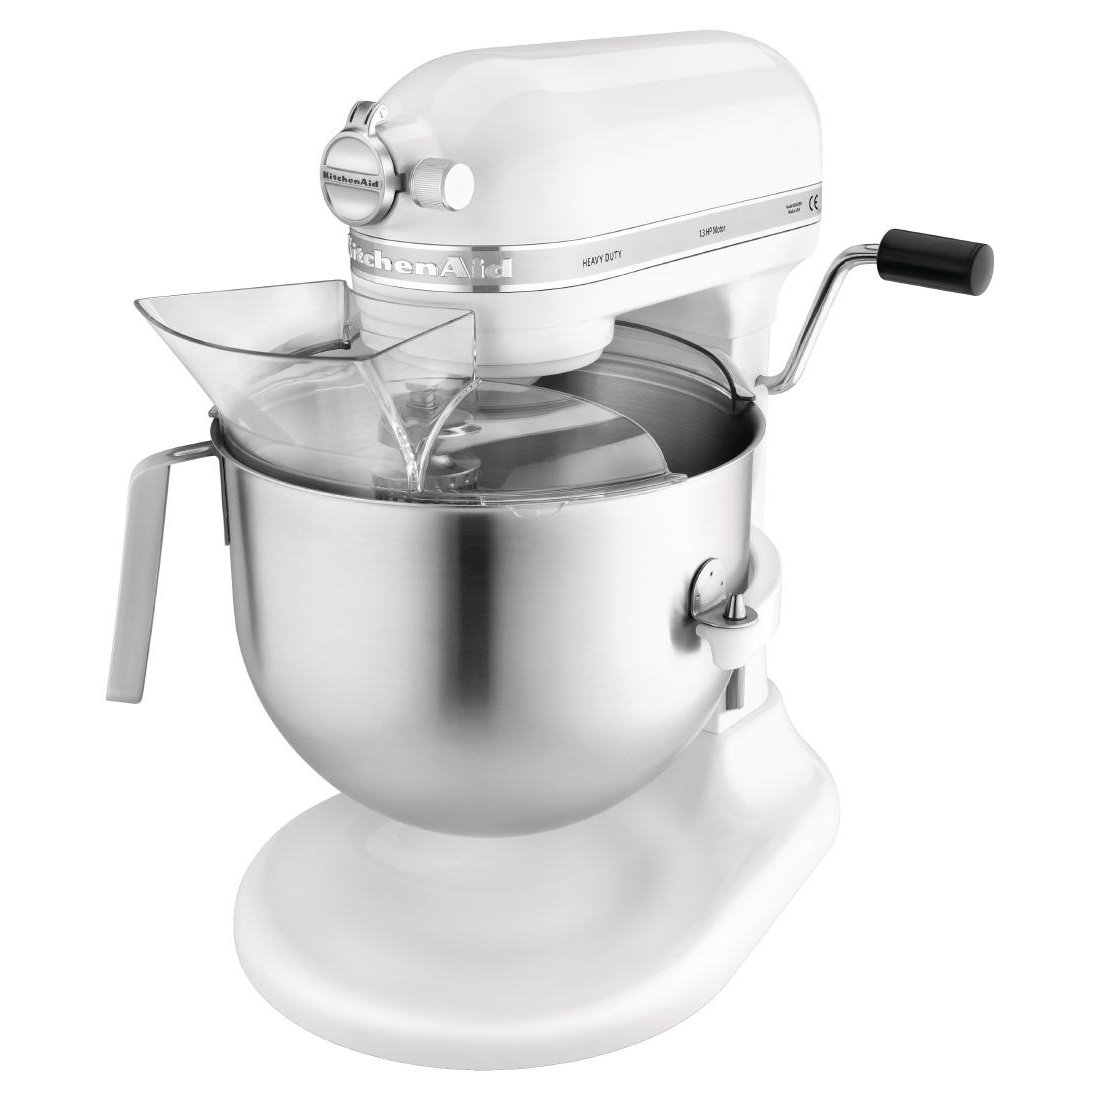 Kitchenaid - Mezclador resistente, 417(H) x 287(W) x 371(D) mm, blanco, 1